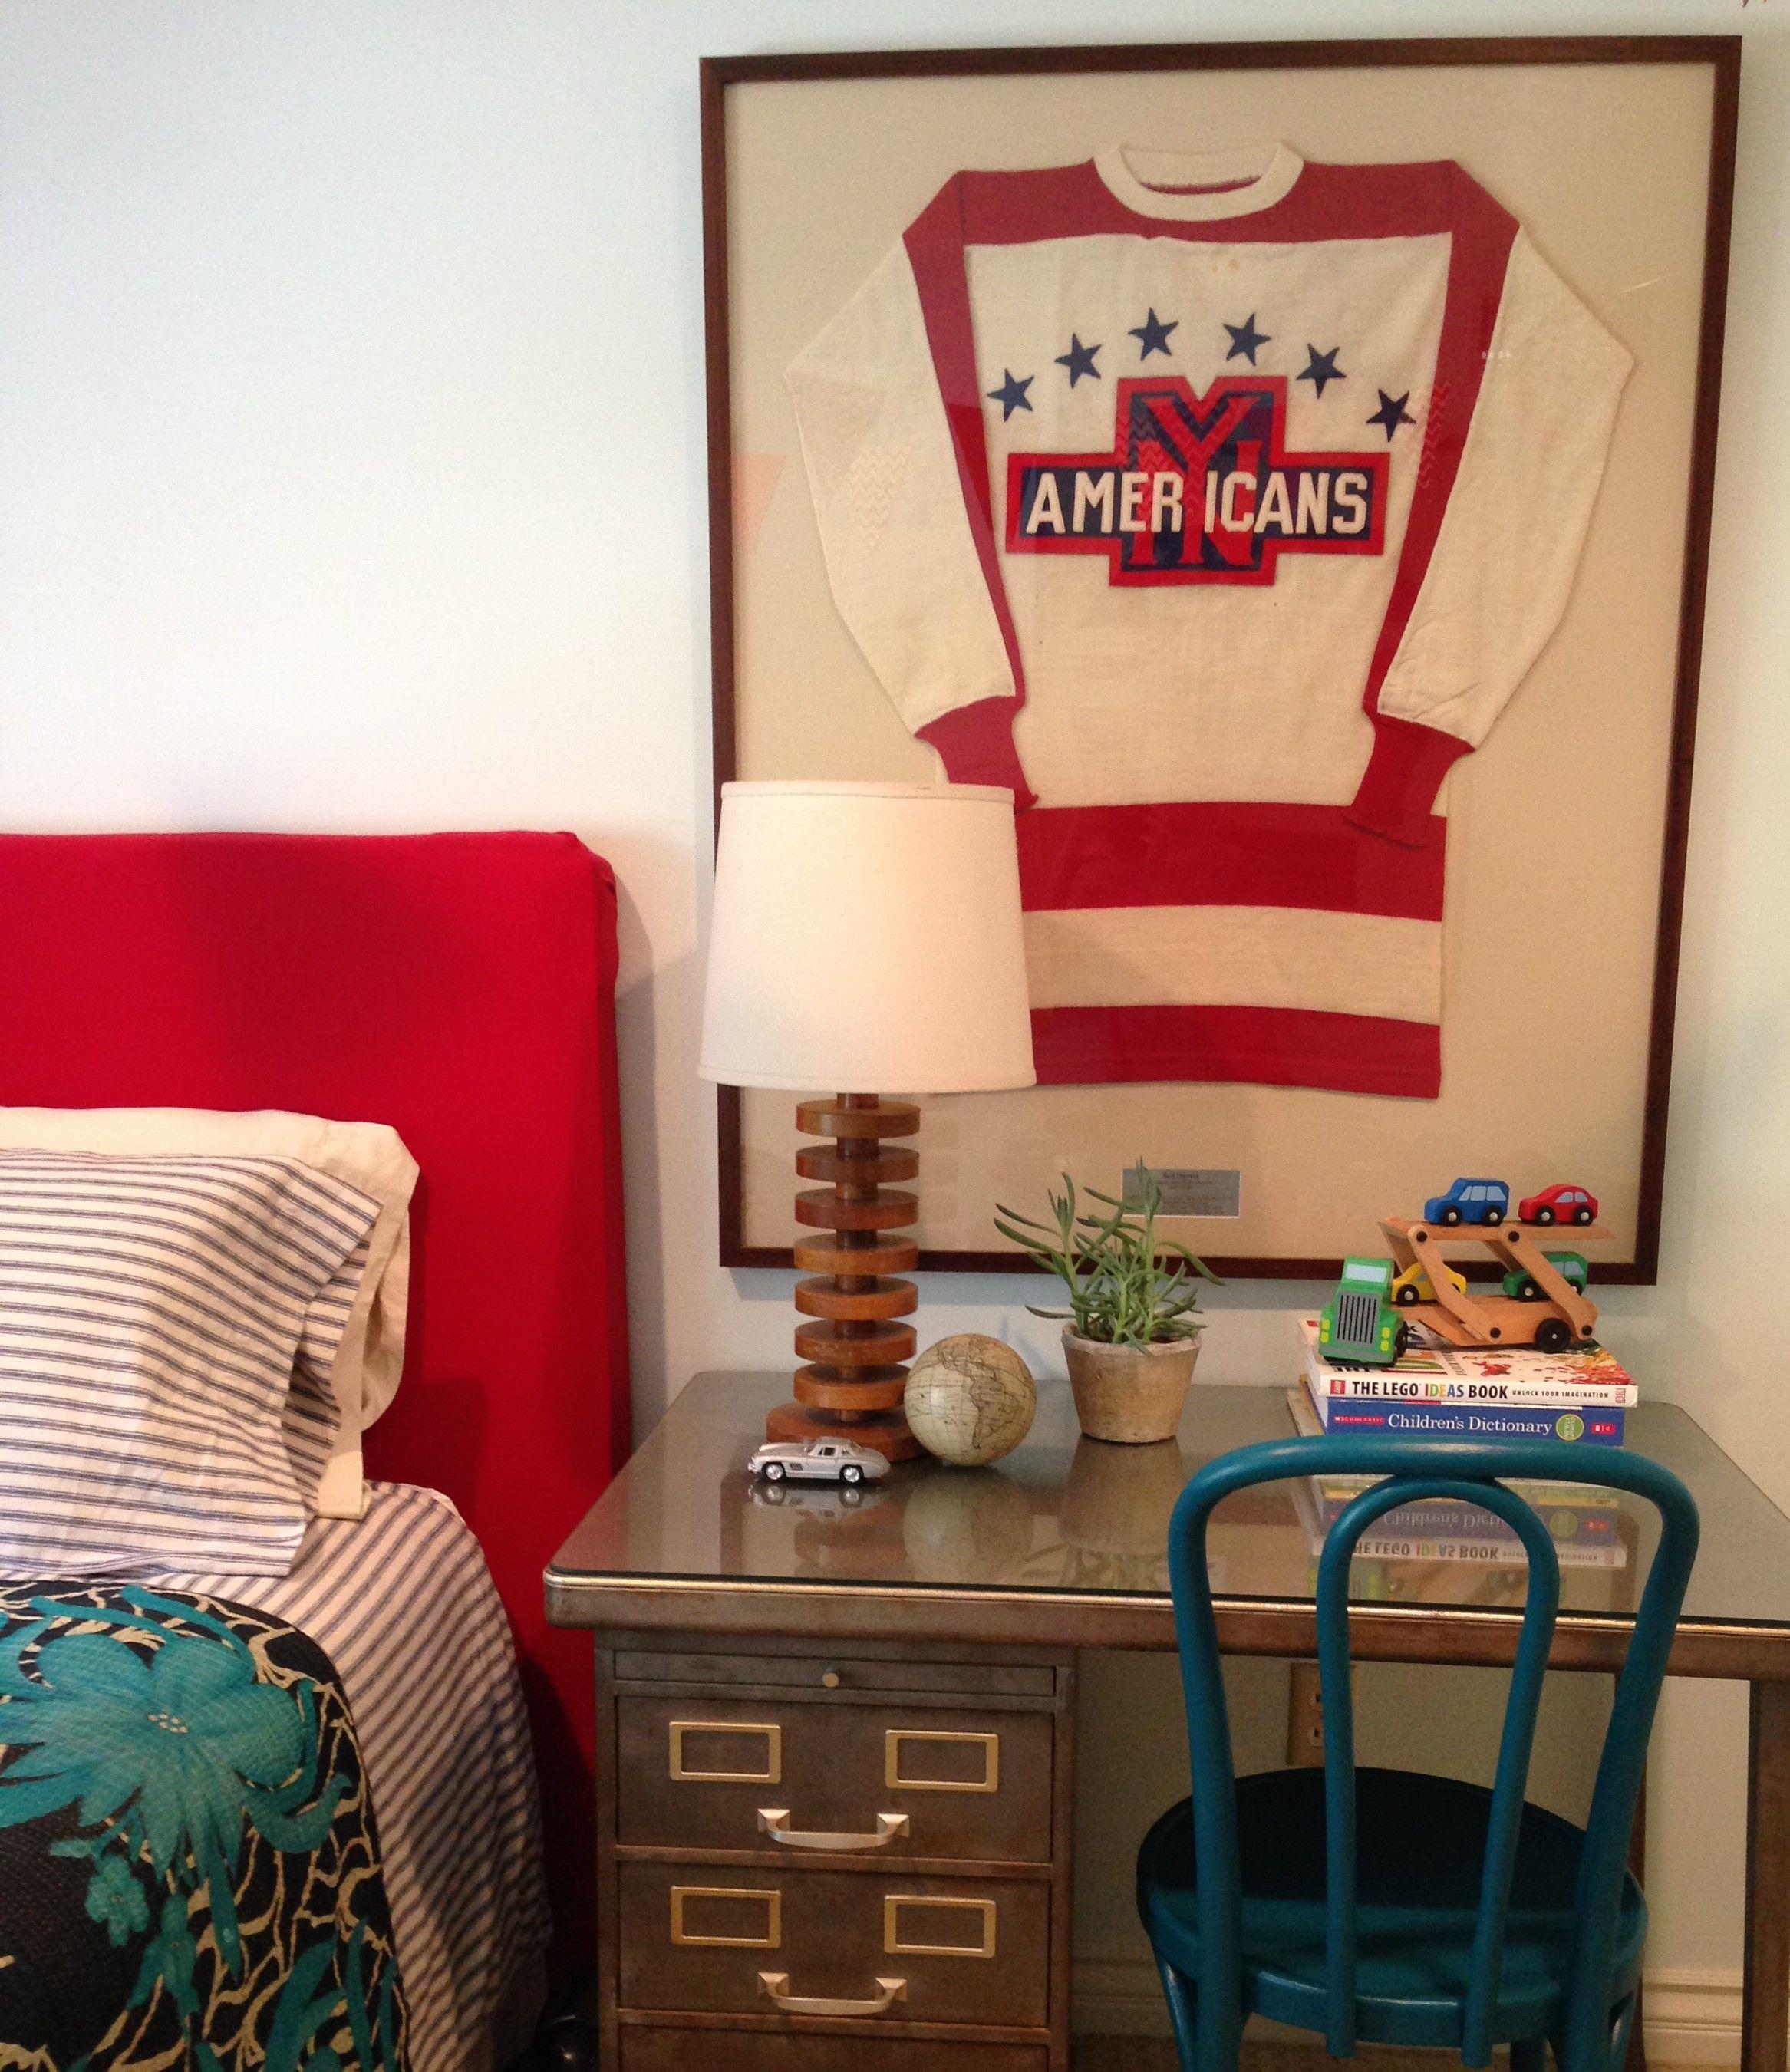 Boy S Bedroom Interior Design By Www Annahackathorn Com Framed Vintage Hockey Jersey Vintage Me Red Headboard Kids Interior Room Kids Room Interior Design